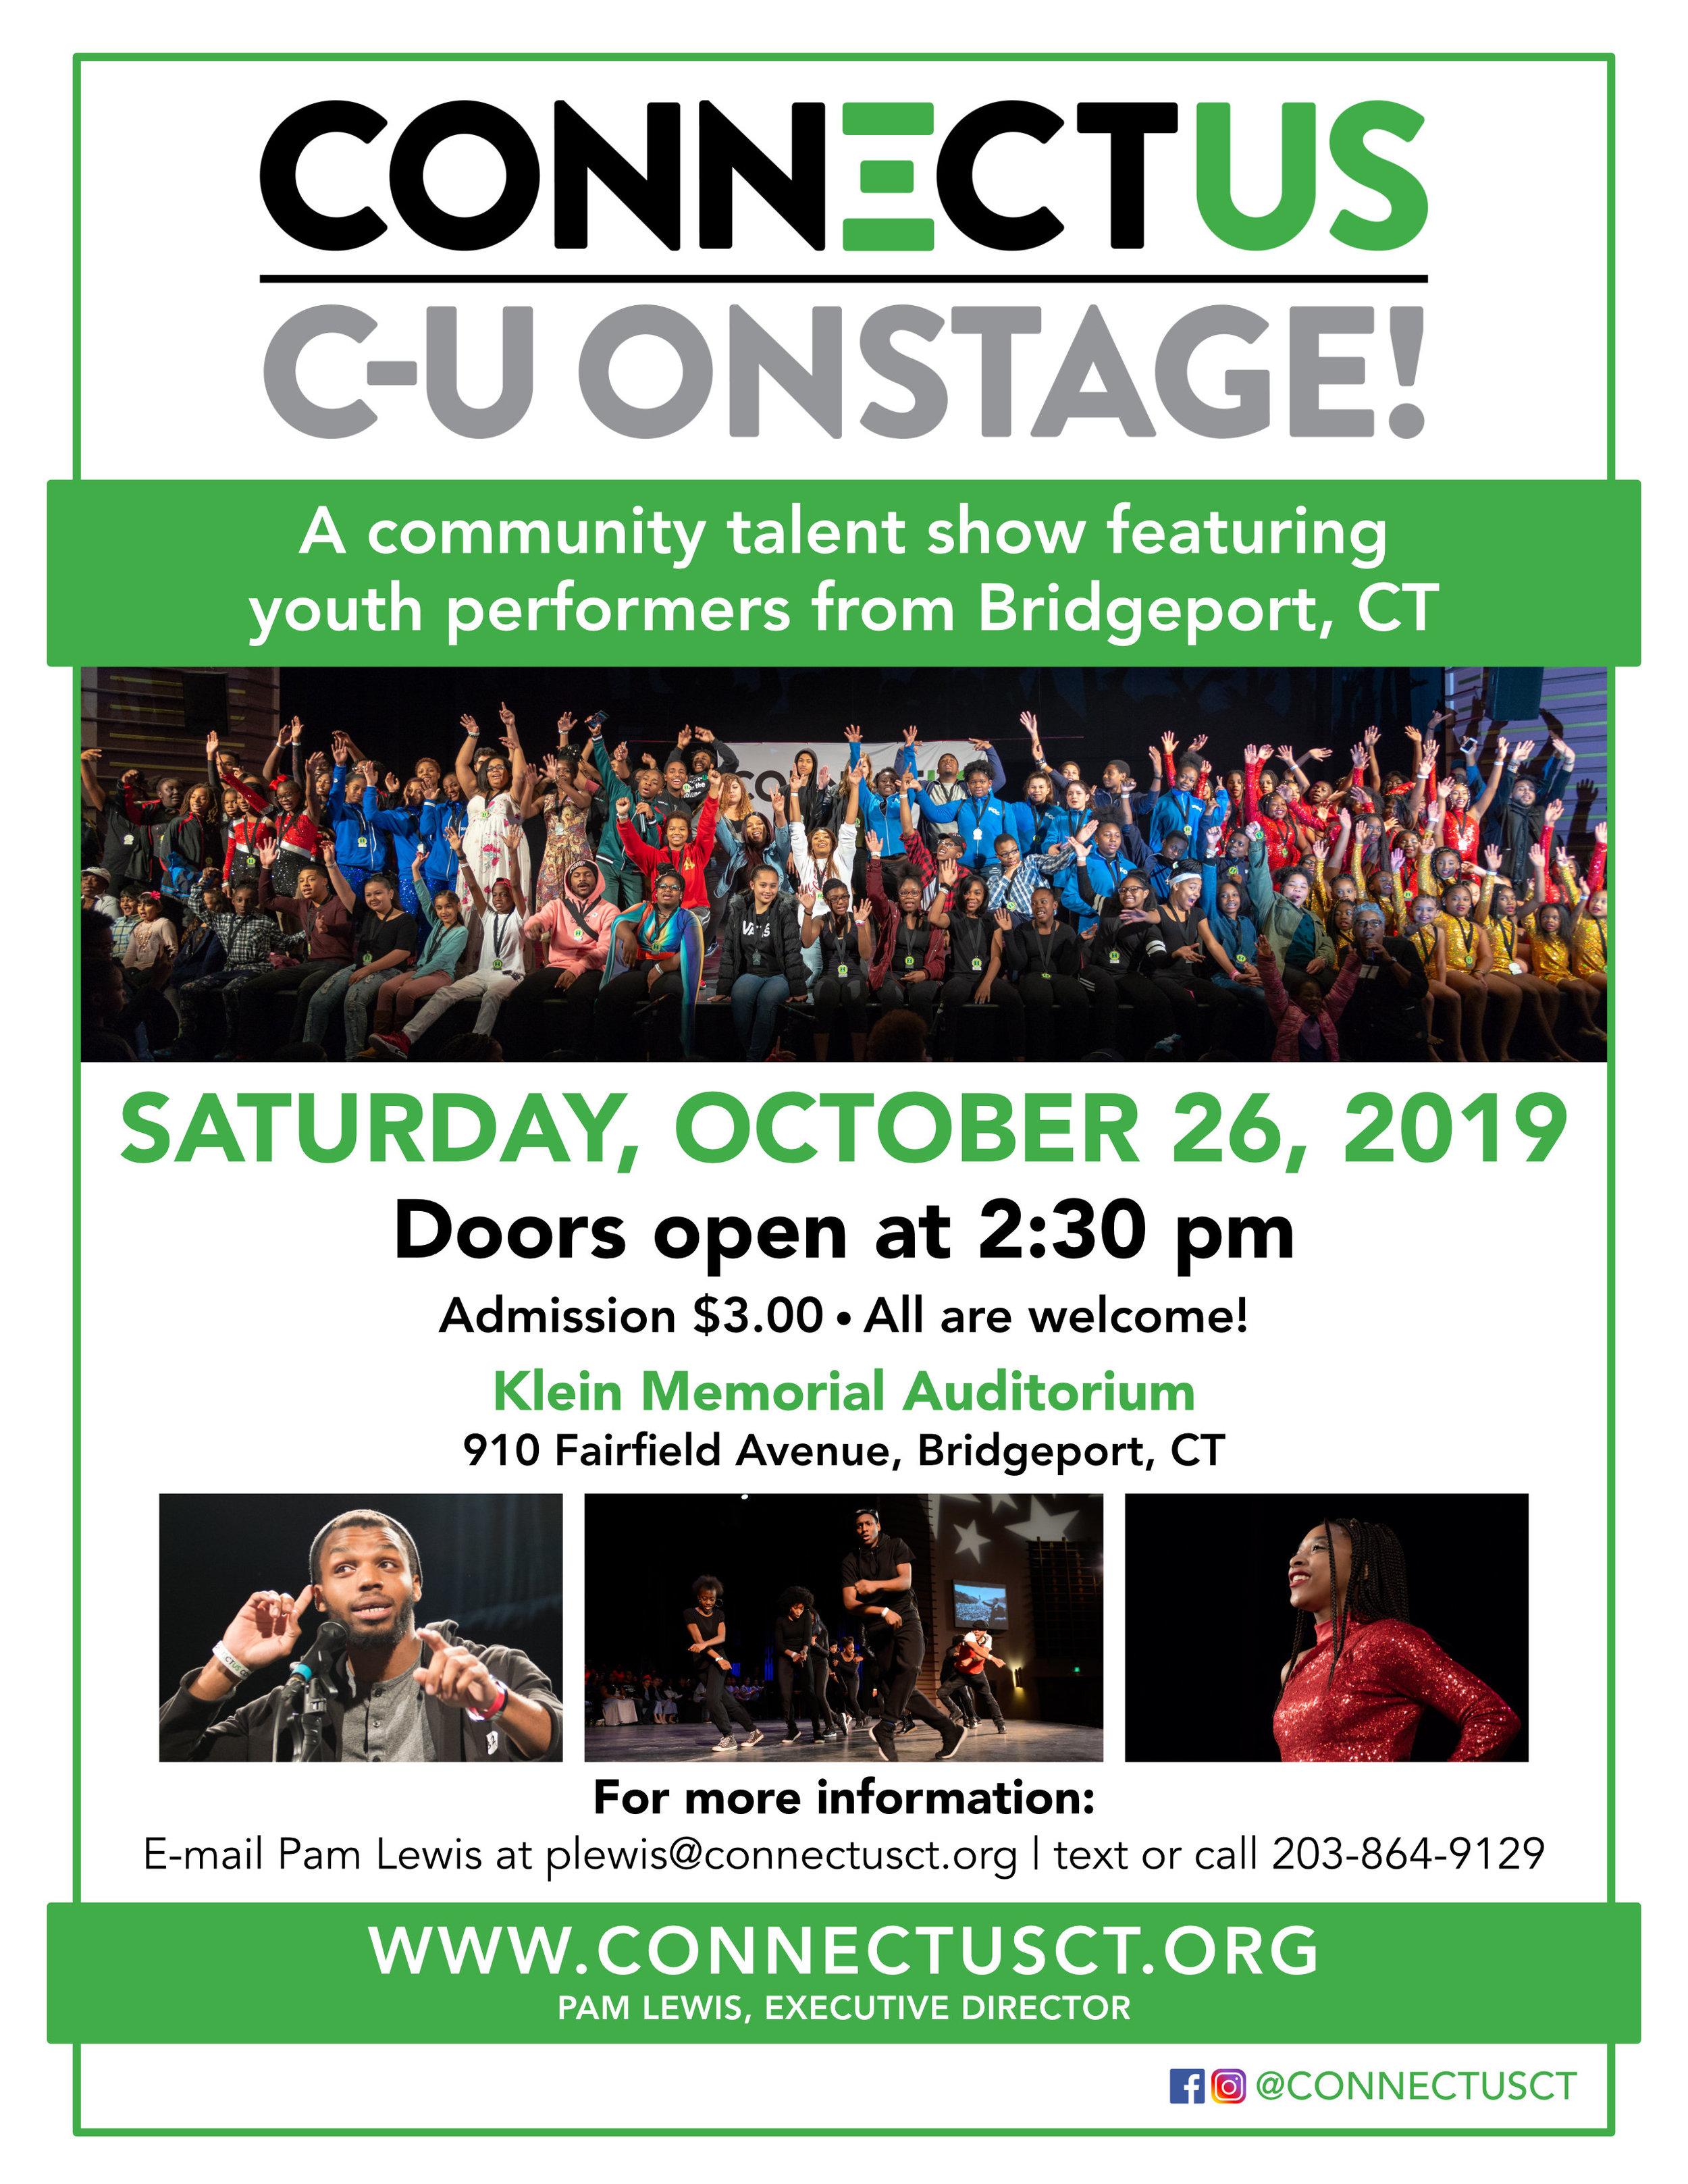 CU Onstage Show Flyer - 2019.jpg